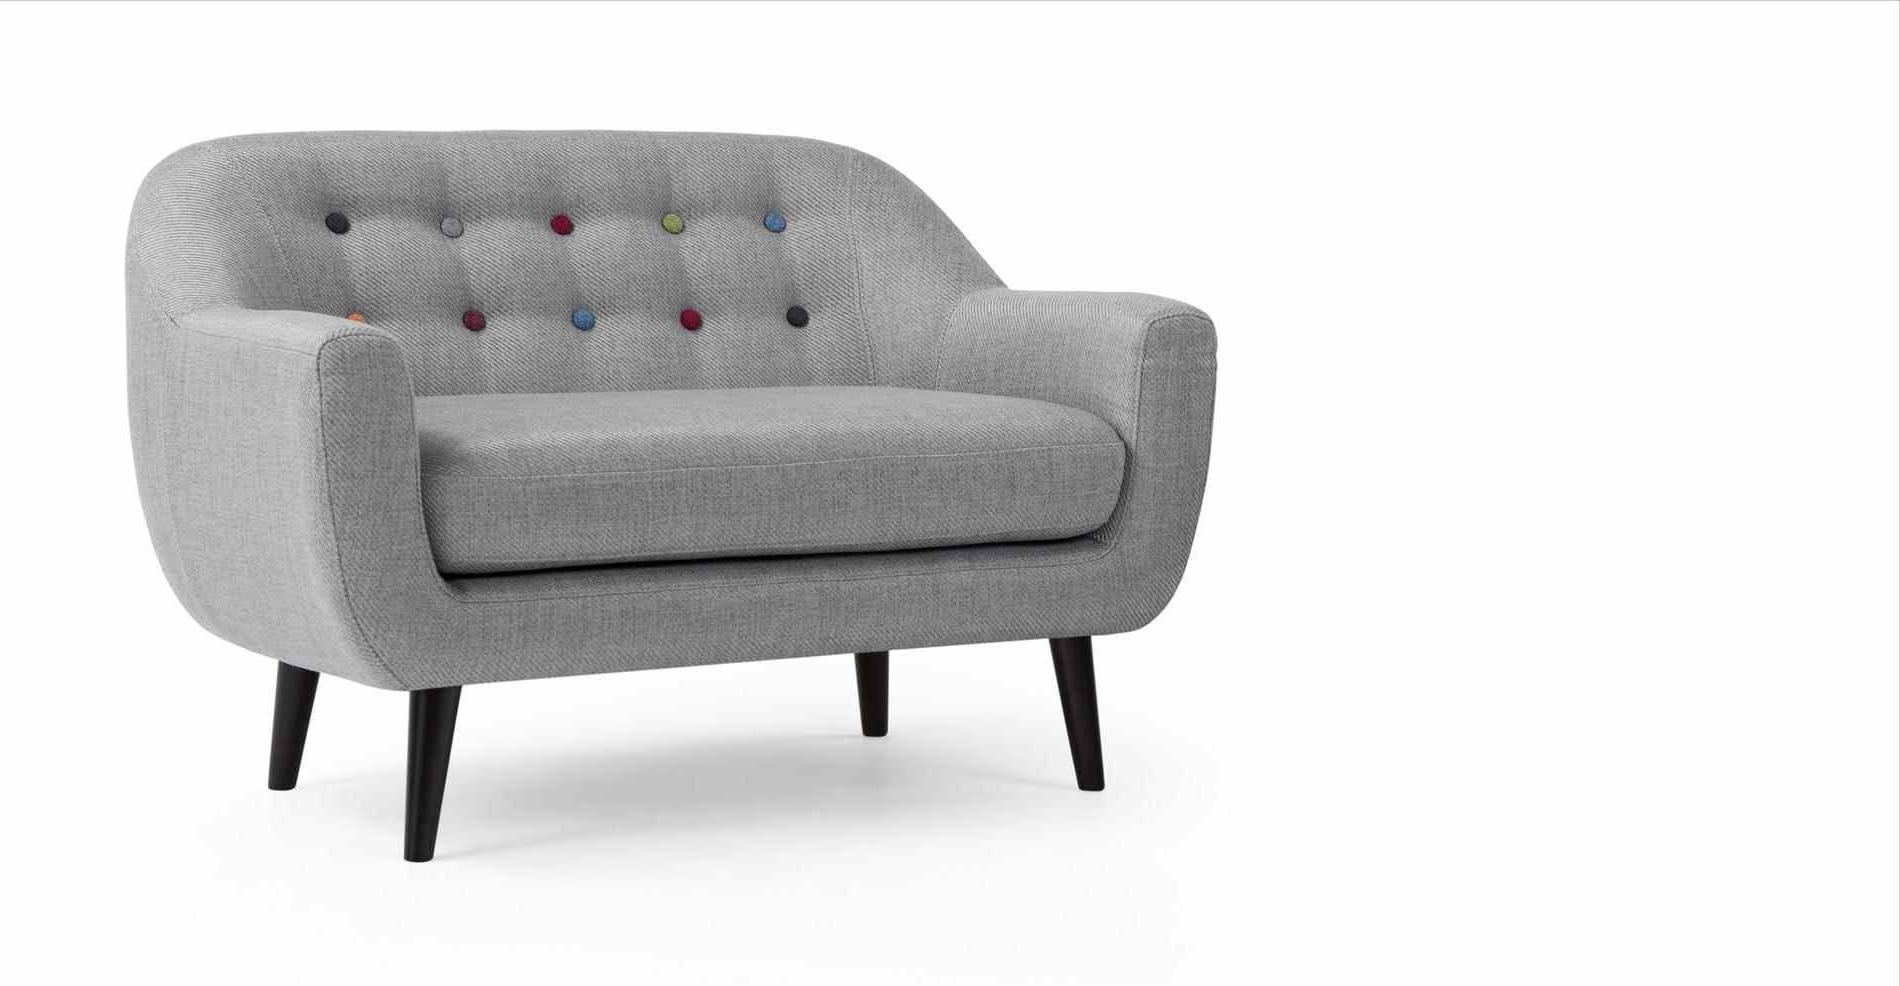 Sofa : With Jinanhongyucom With Mini Sofa For Kids Jinanhongyucom Throughout Preferred Mini Sofas (View 11 of 15)